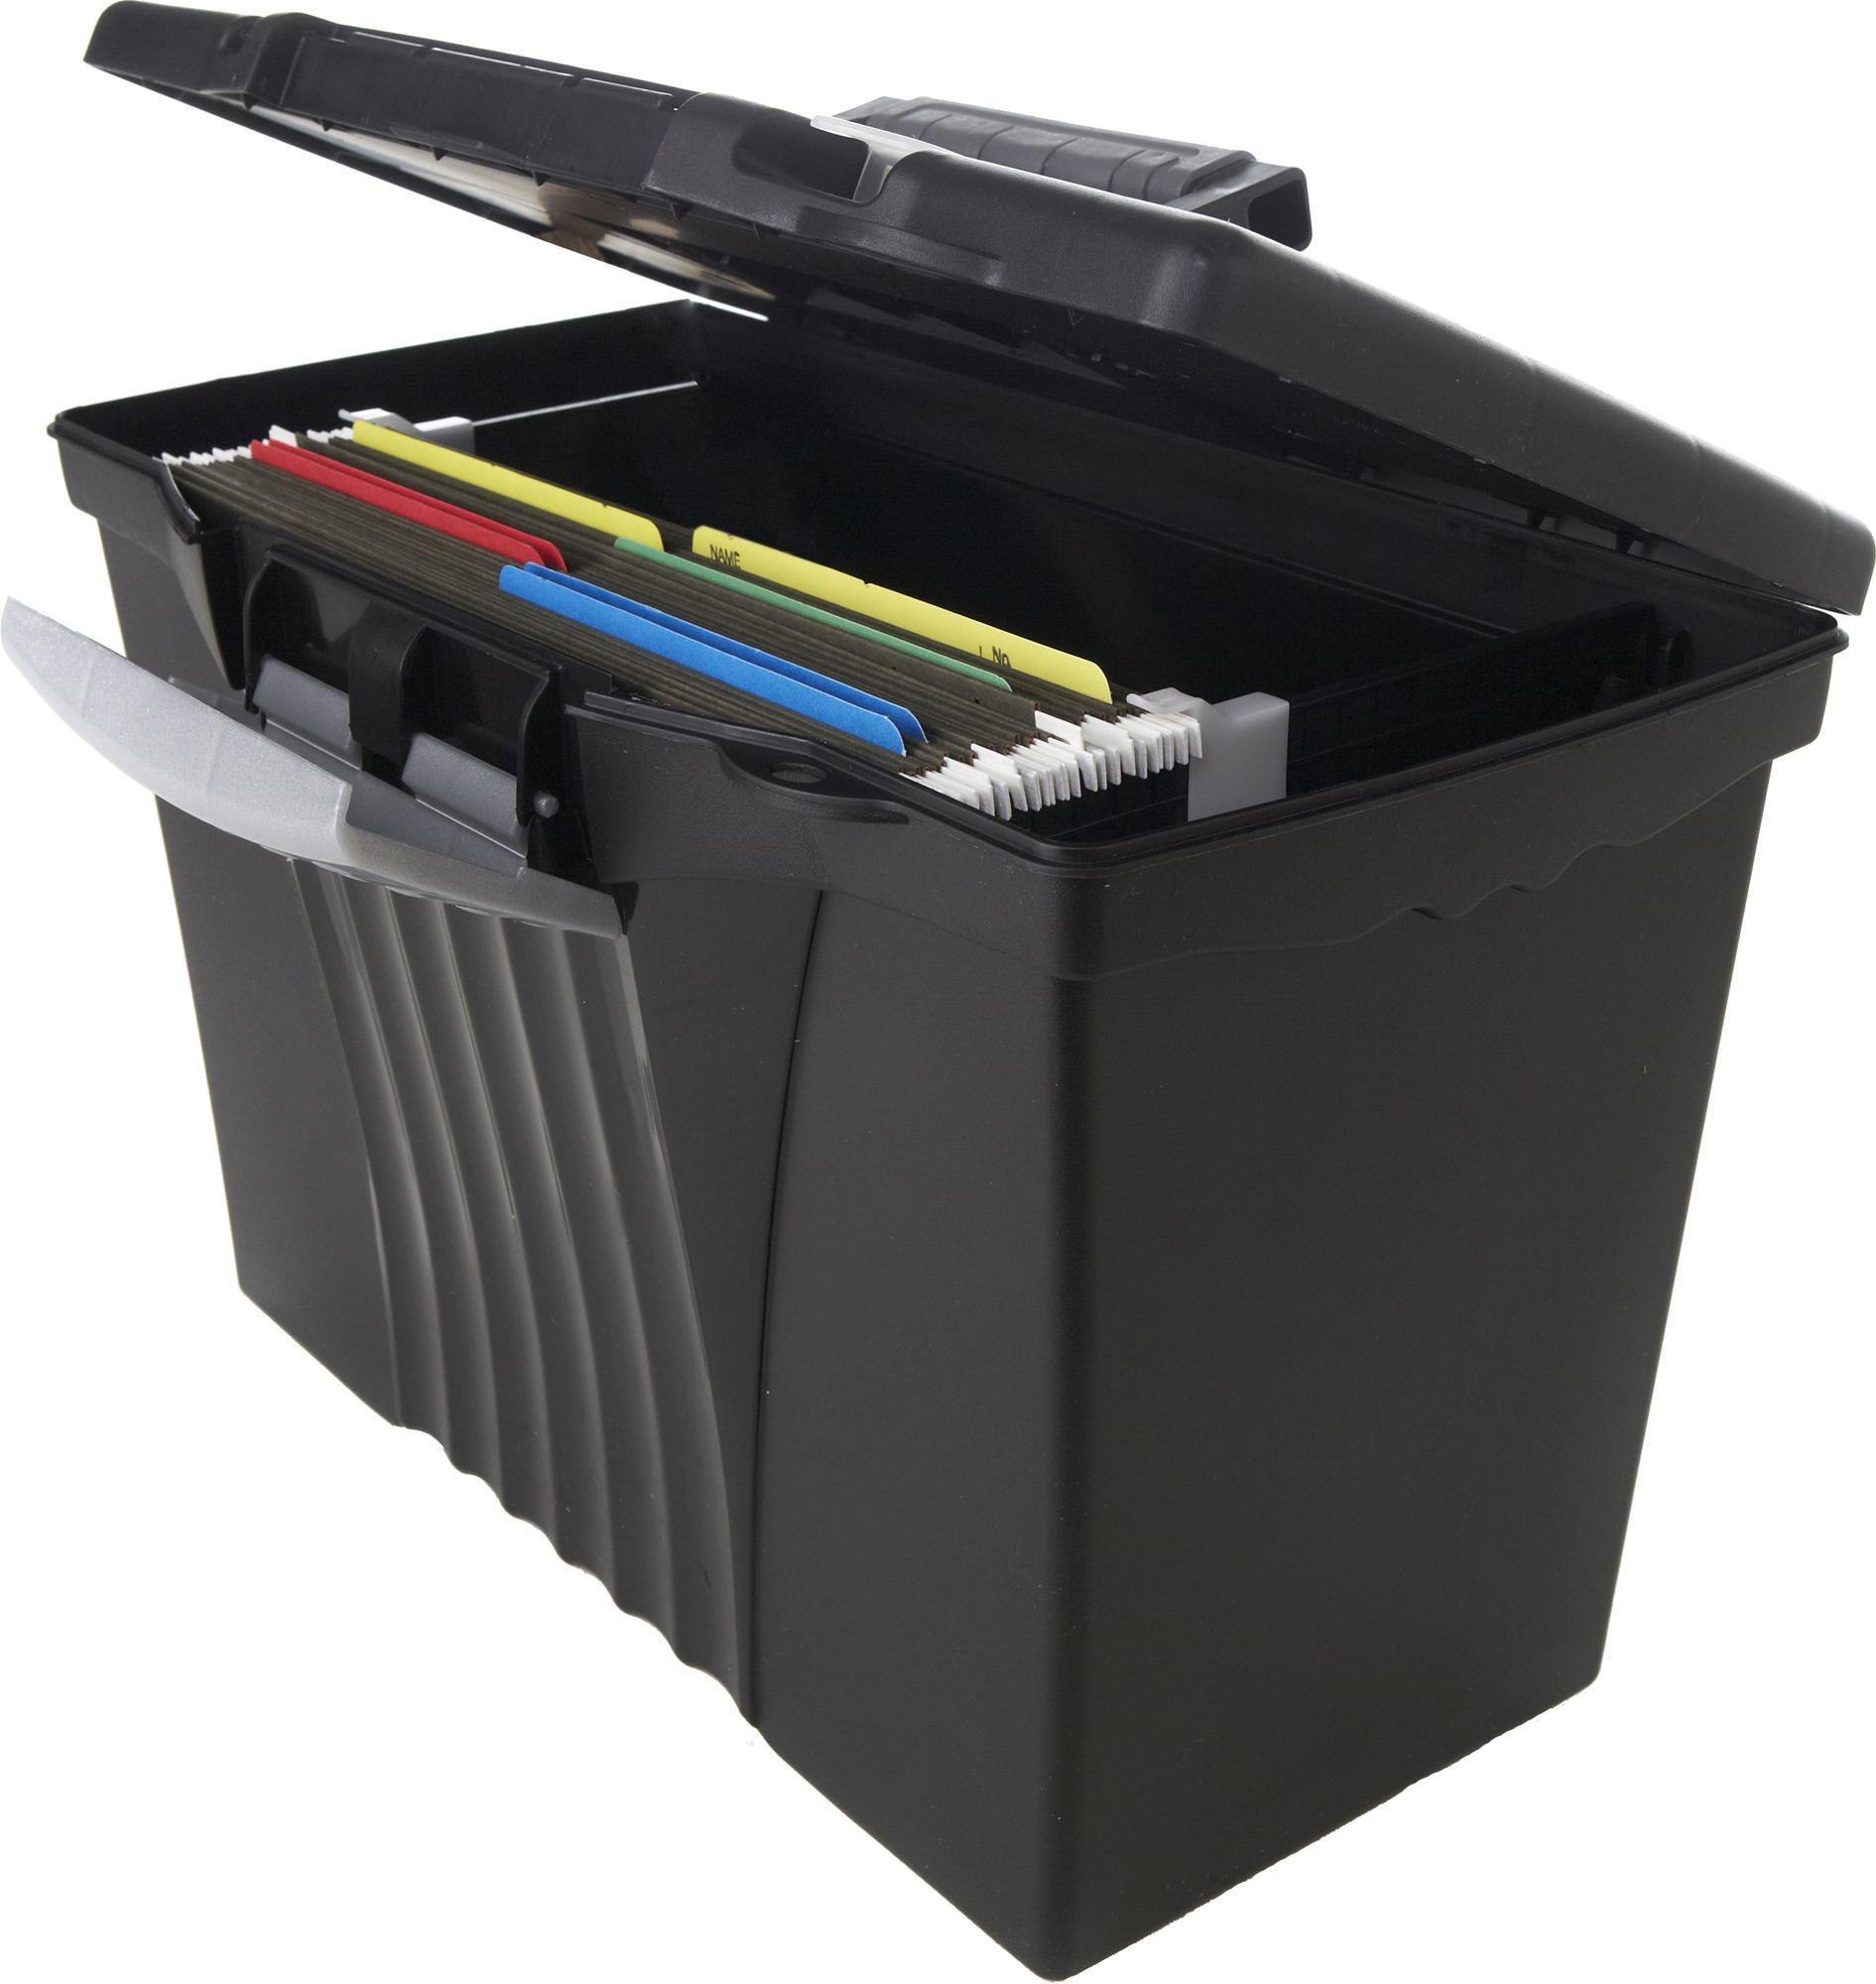 storex letterlegal portable file box with oragnizer lid black boxes stack office file